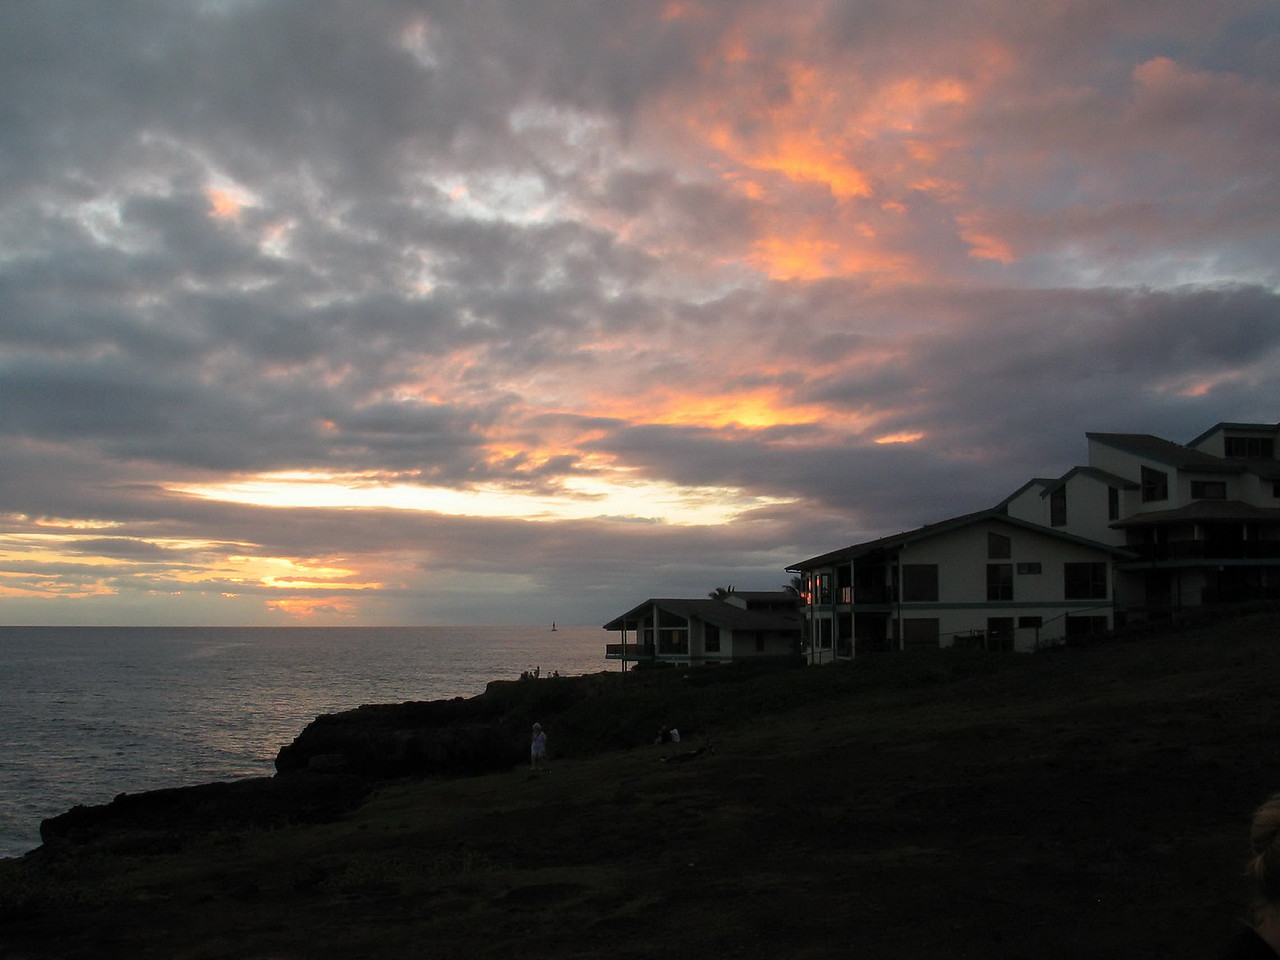 380 - sunset at The Point at Poipu Resort